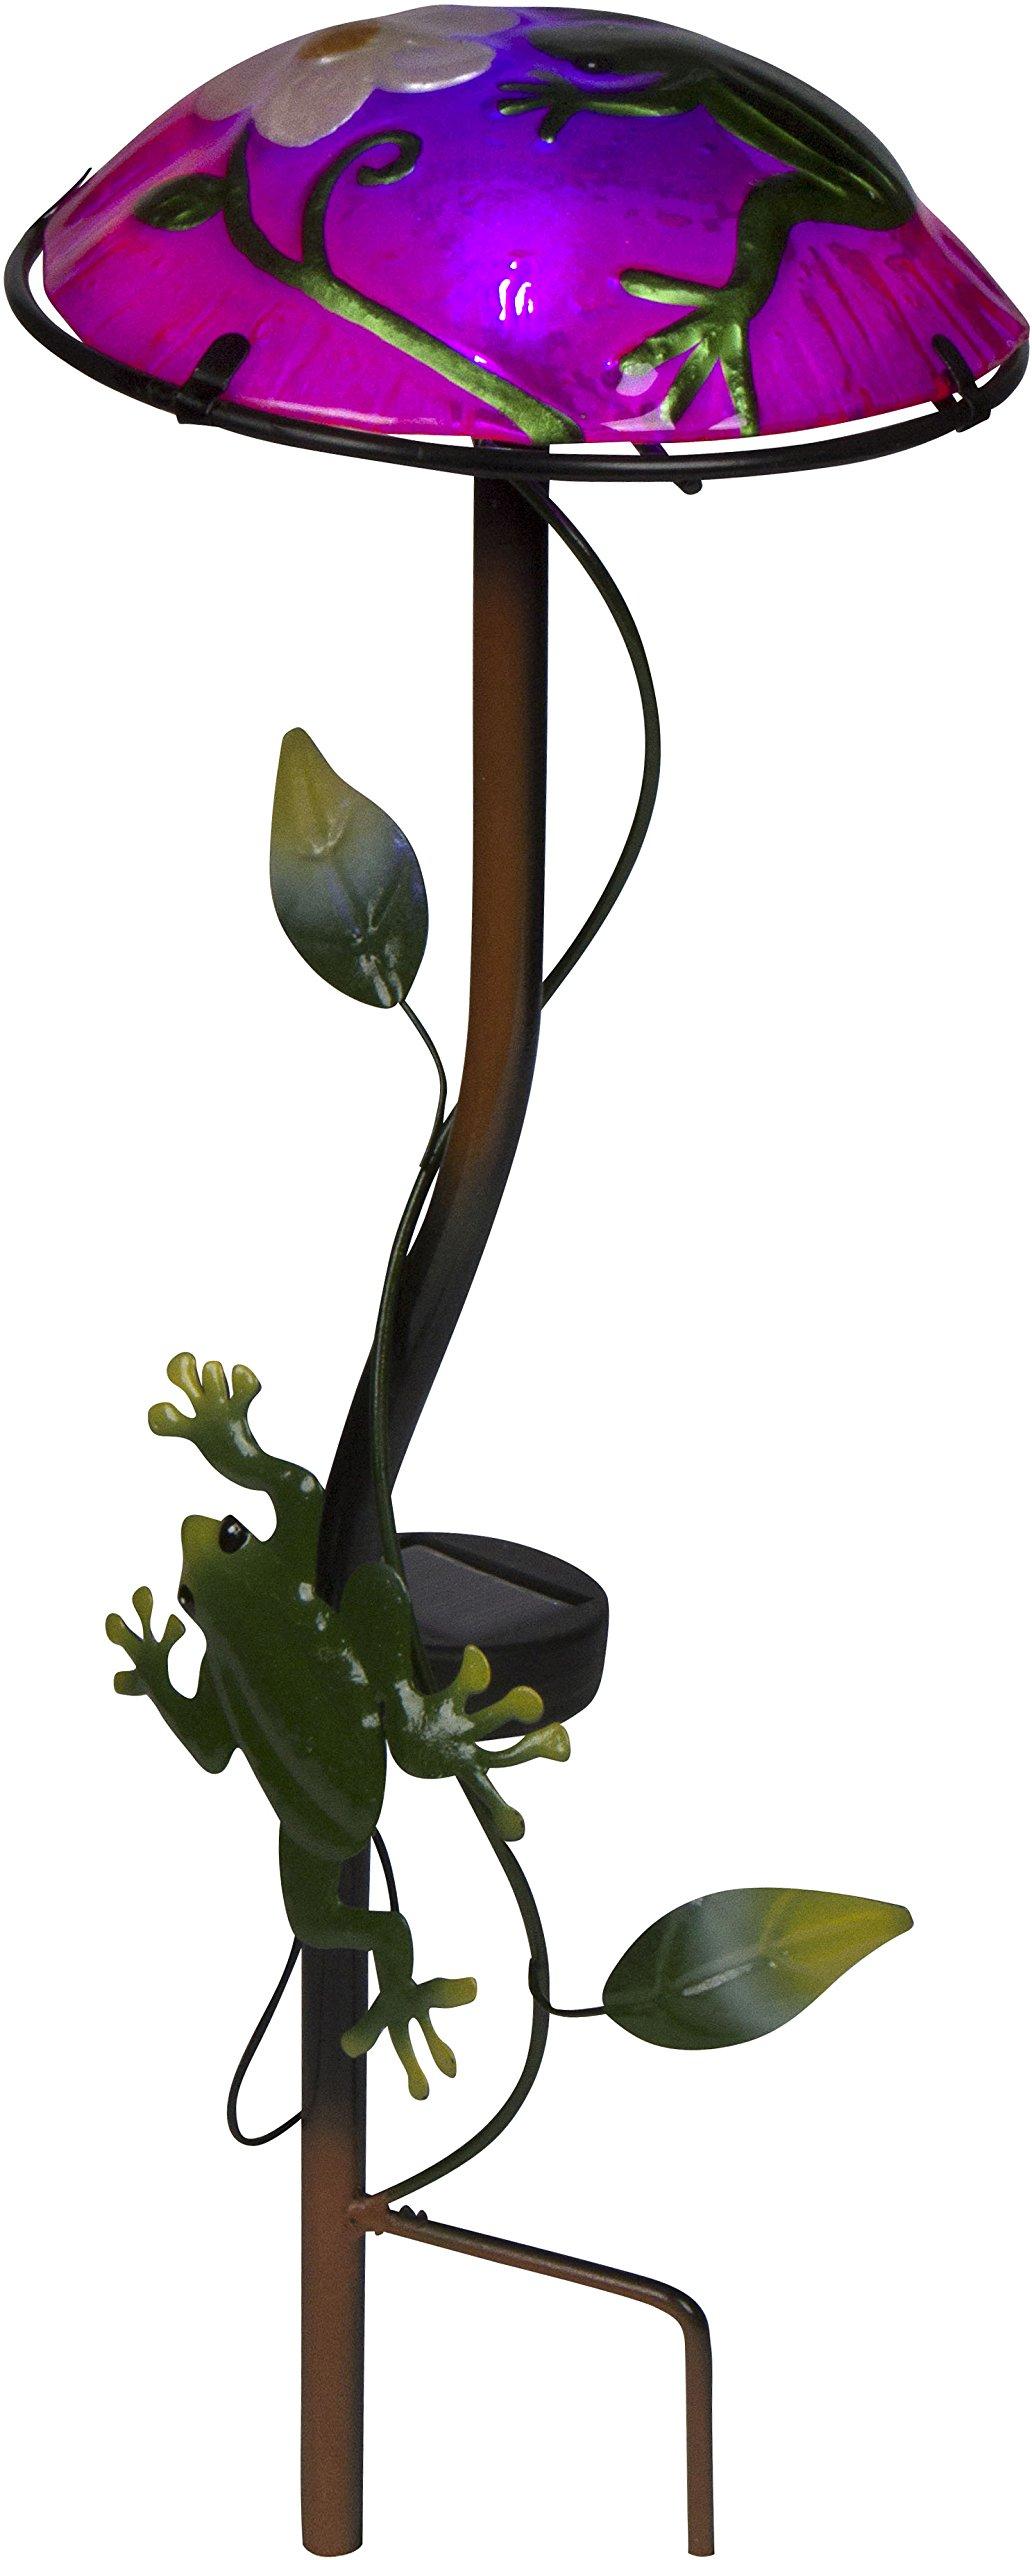 12'' Solar Mushroom Garden Stake with Frog Design by Trademark Innovations (Light Green) by Trademark Innovations (Image #1)